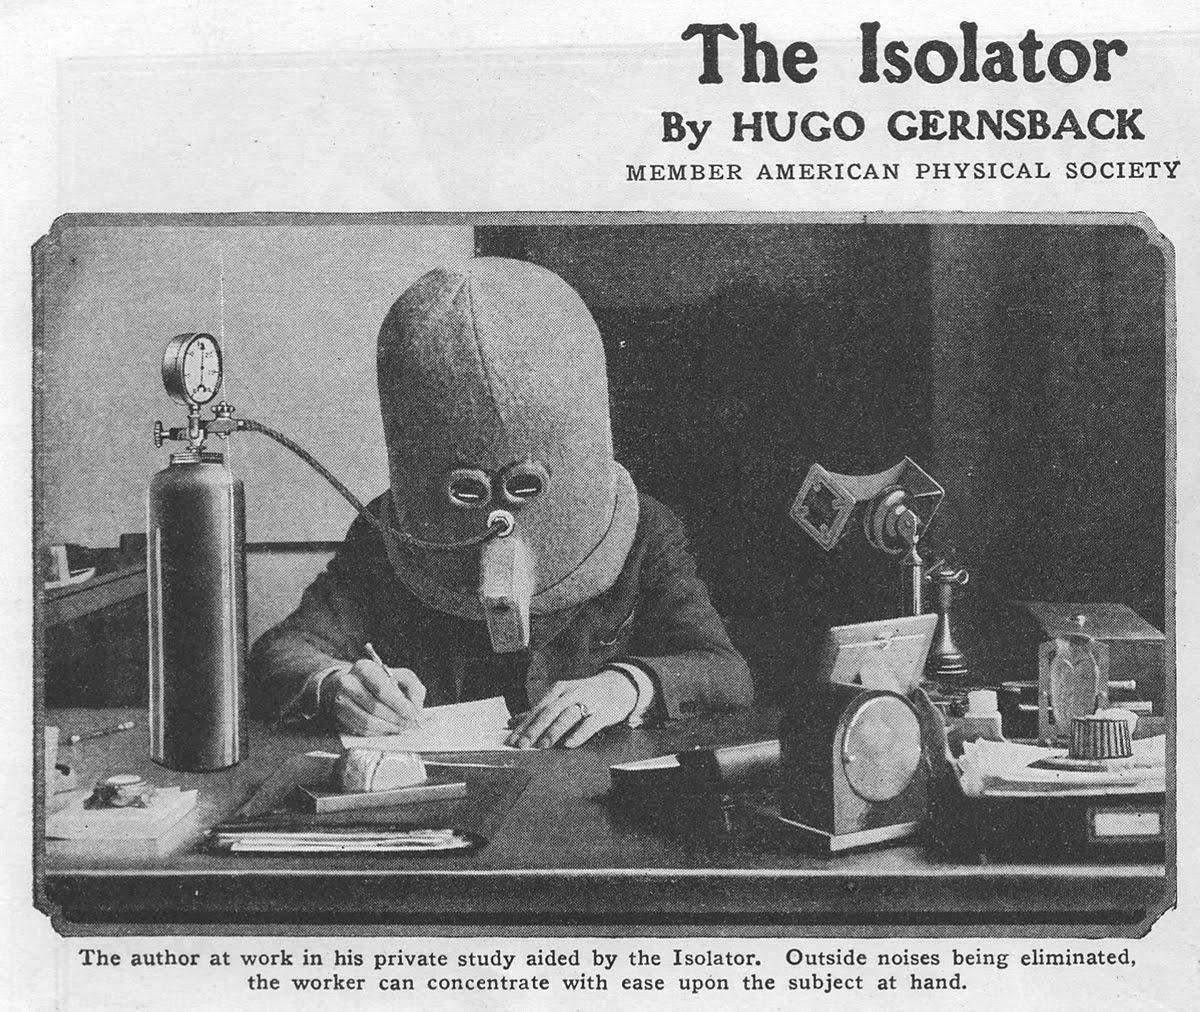 The Isolator, avant la lettre productivity tool.